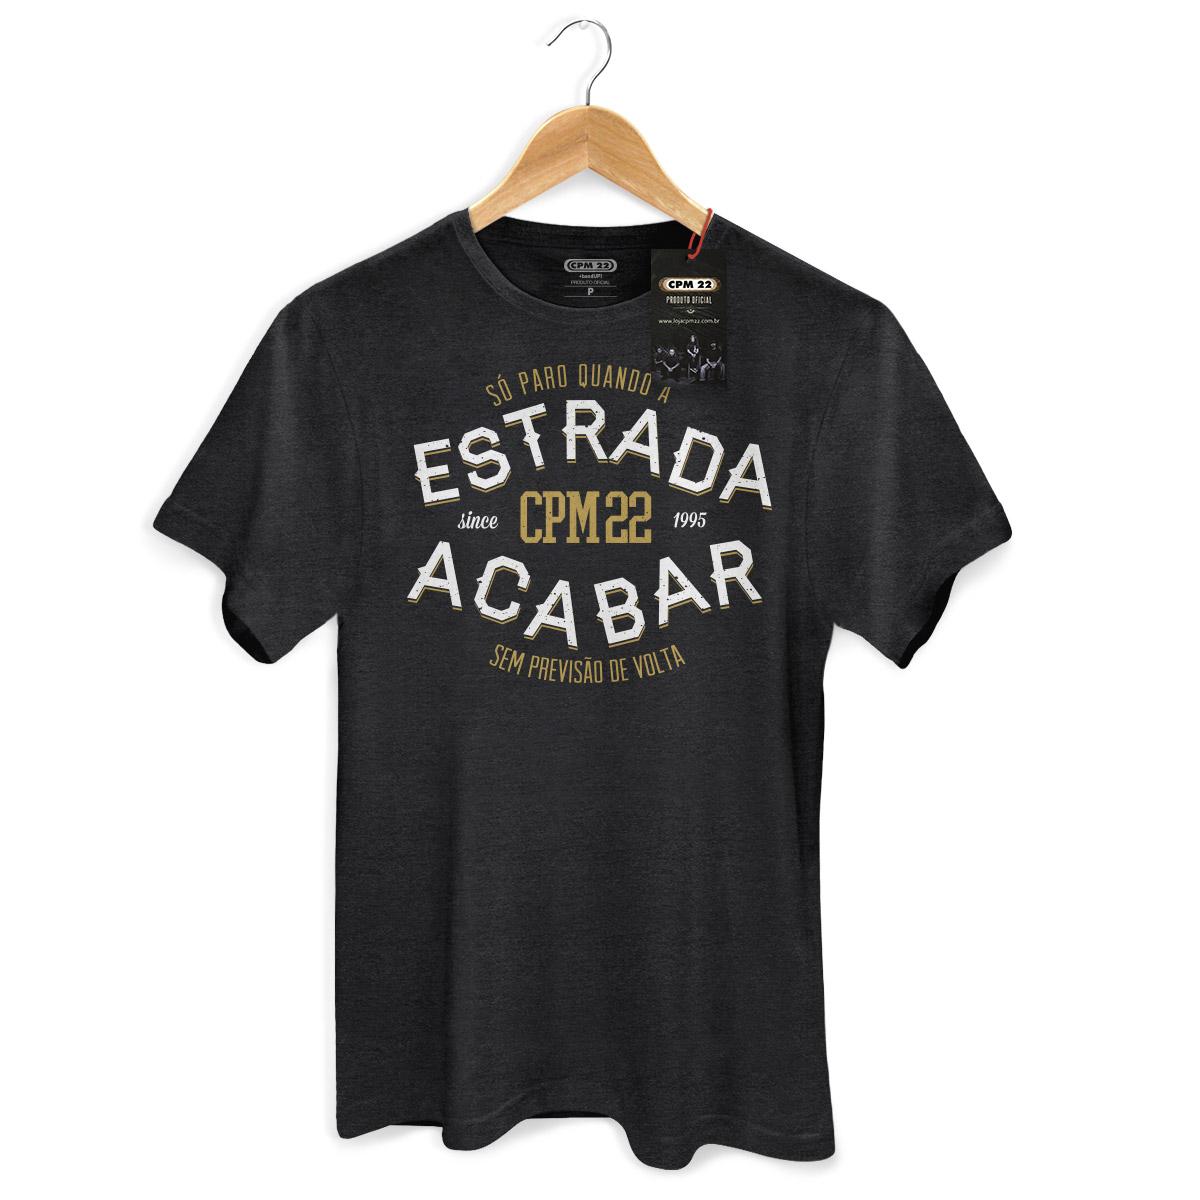 T-shirt Premium Masculina CPM 22 S� Paro Quando a Estrada Acabar